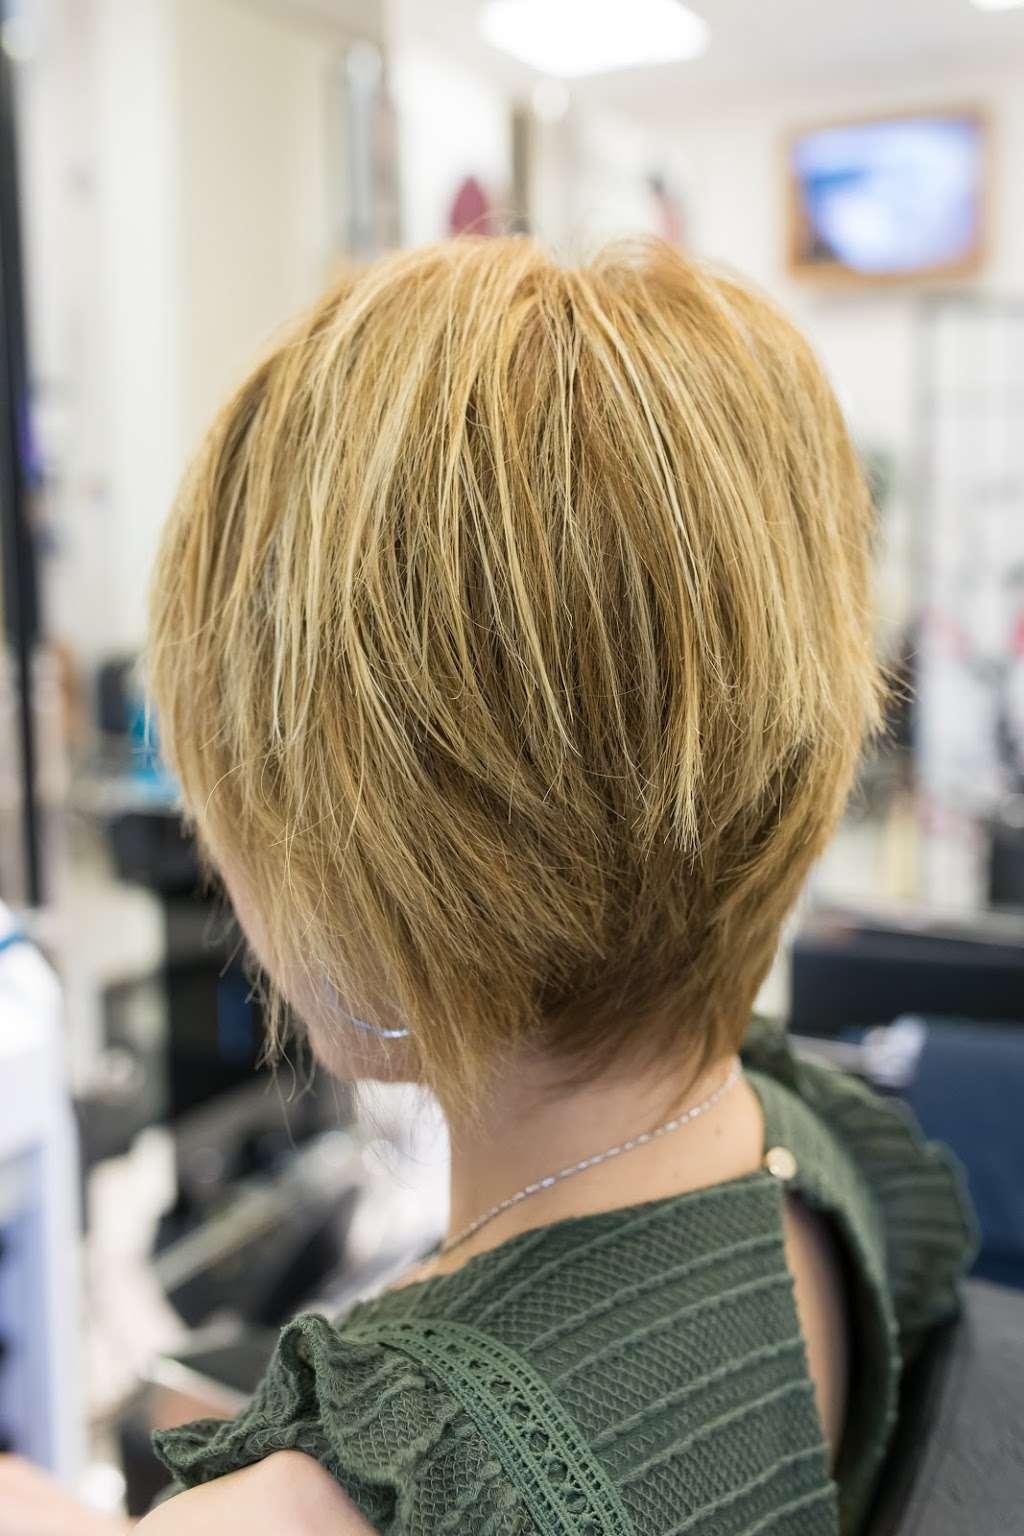 Cozy Hair Salon - hair care  | Photo 2 of 10 | Address: 2814 S Shepherd Dr, Houston, TX 77098, USA | Phone: (832) 684-9699